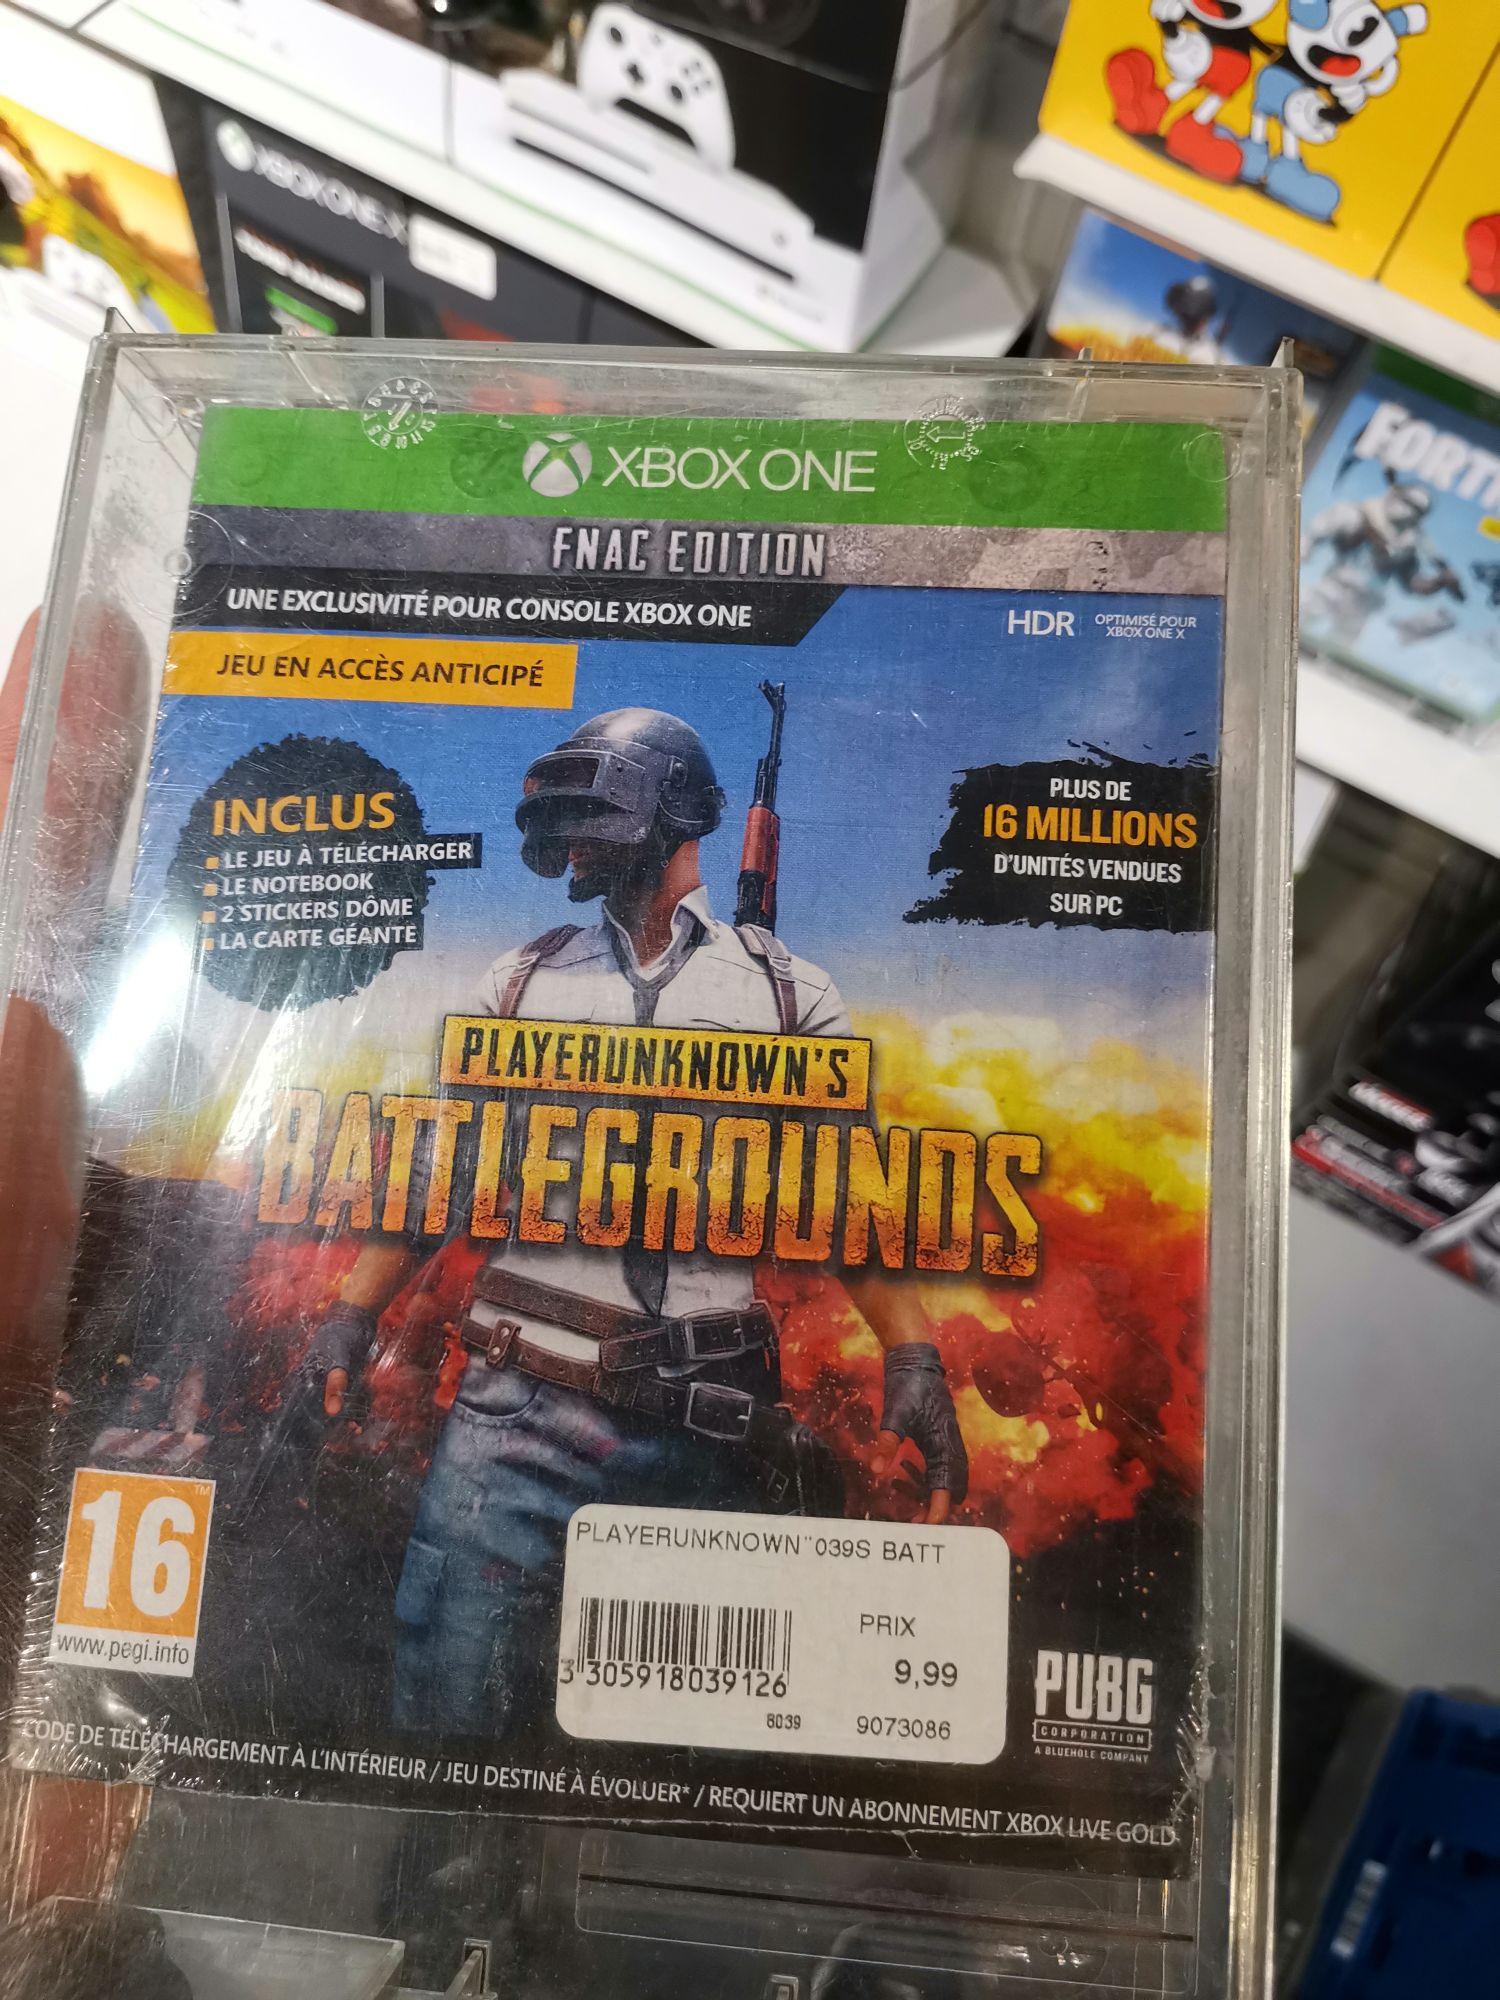 PlayerUnknown's Battlegrounds Edition Fnac sur Xbox One - Fnac La Défense (92)